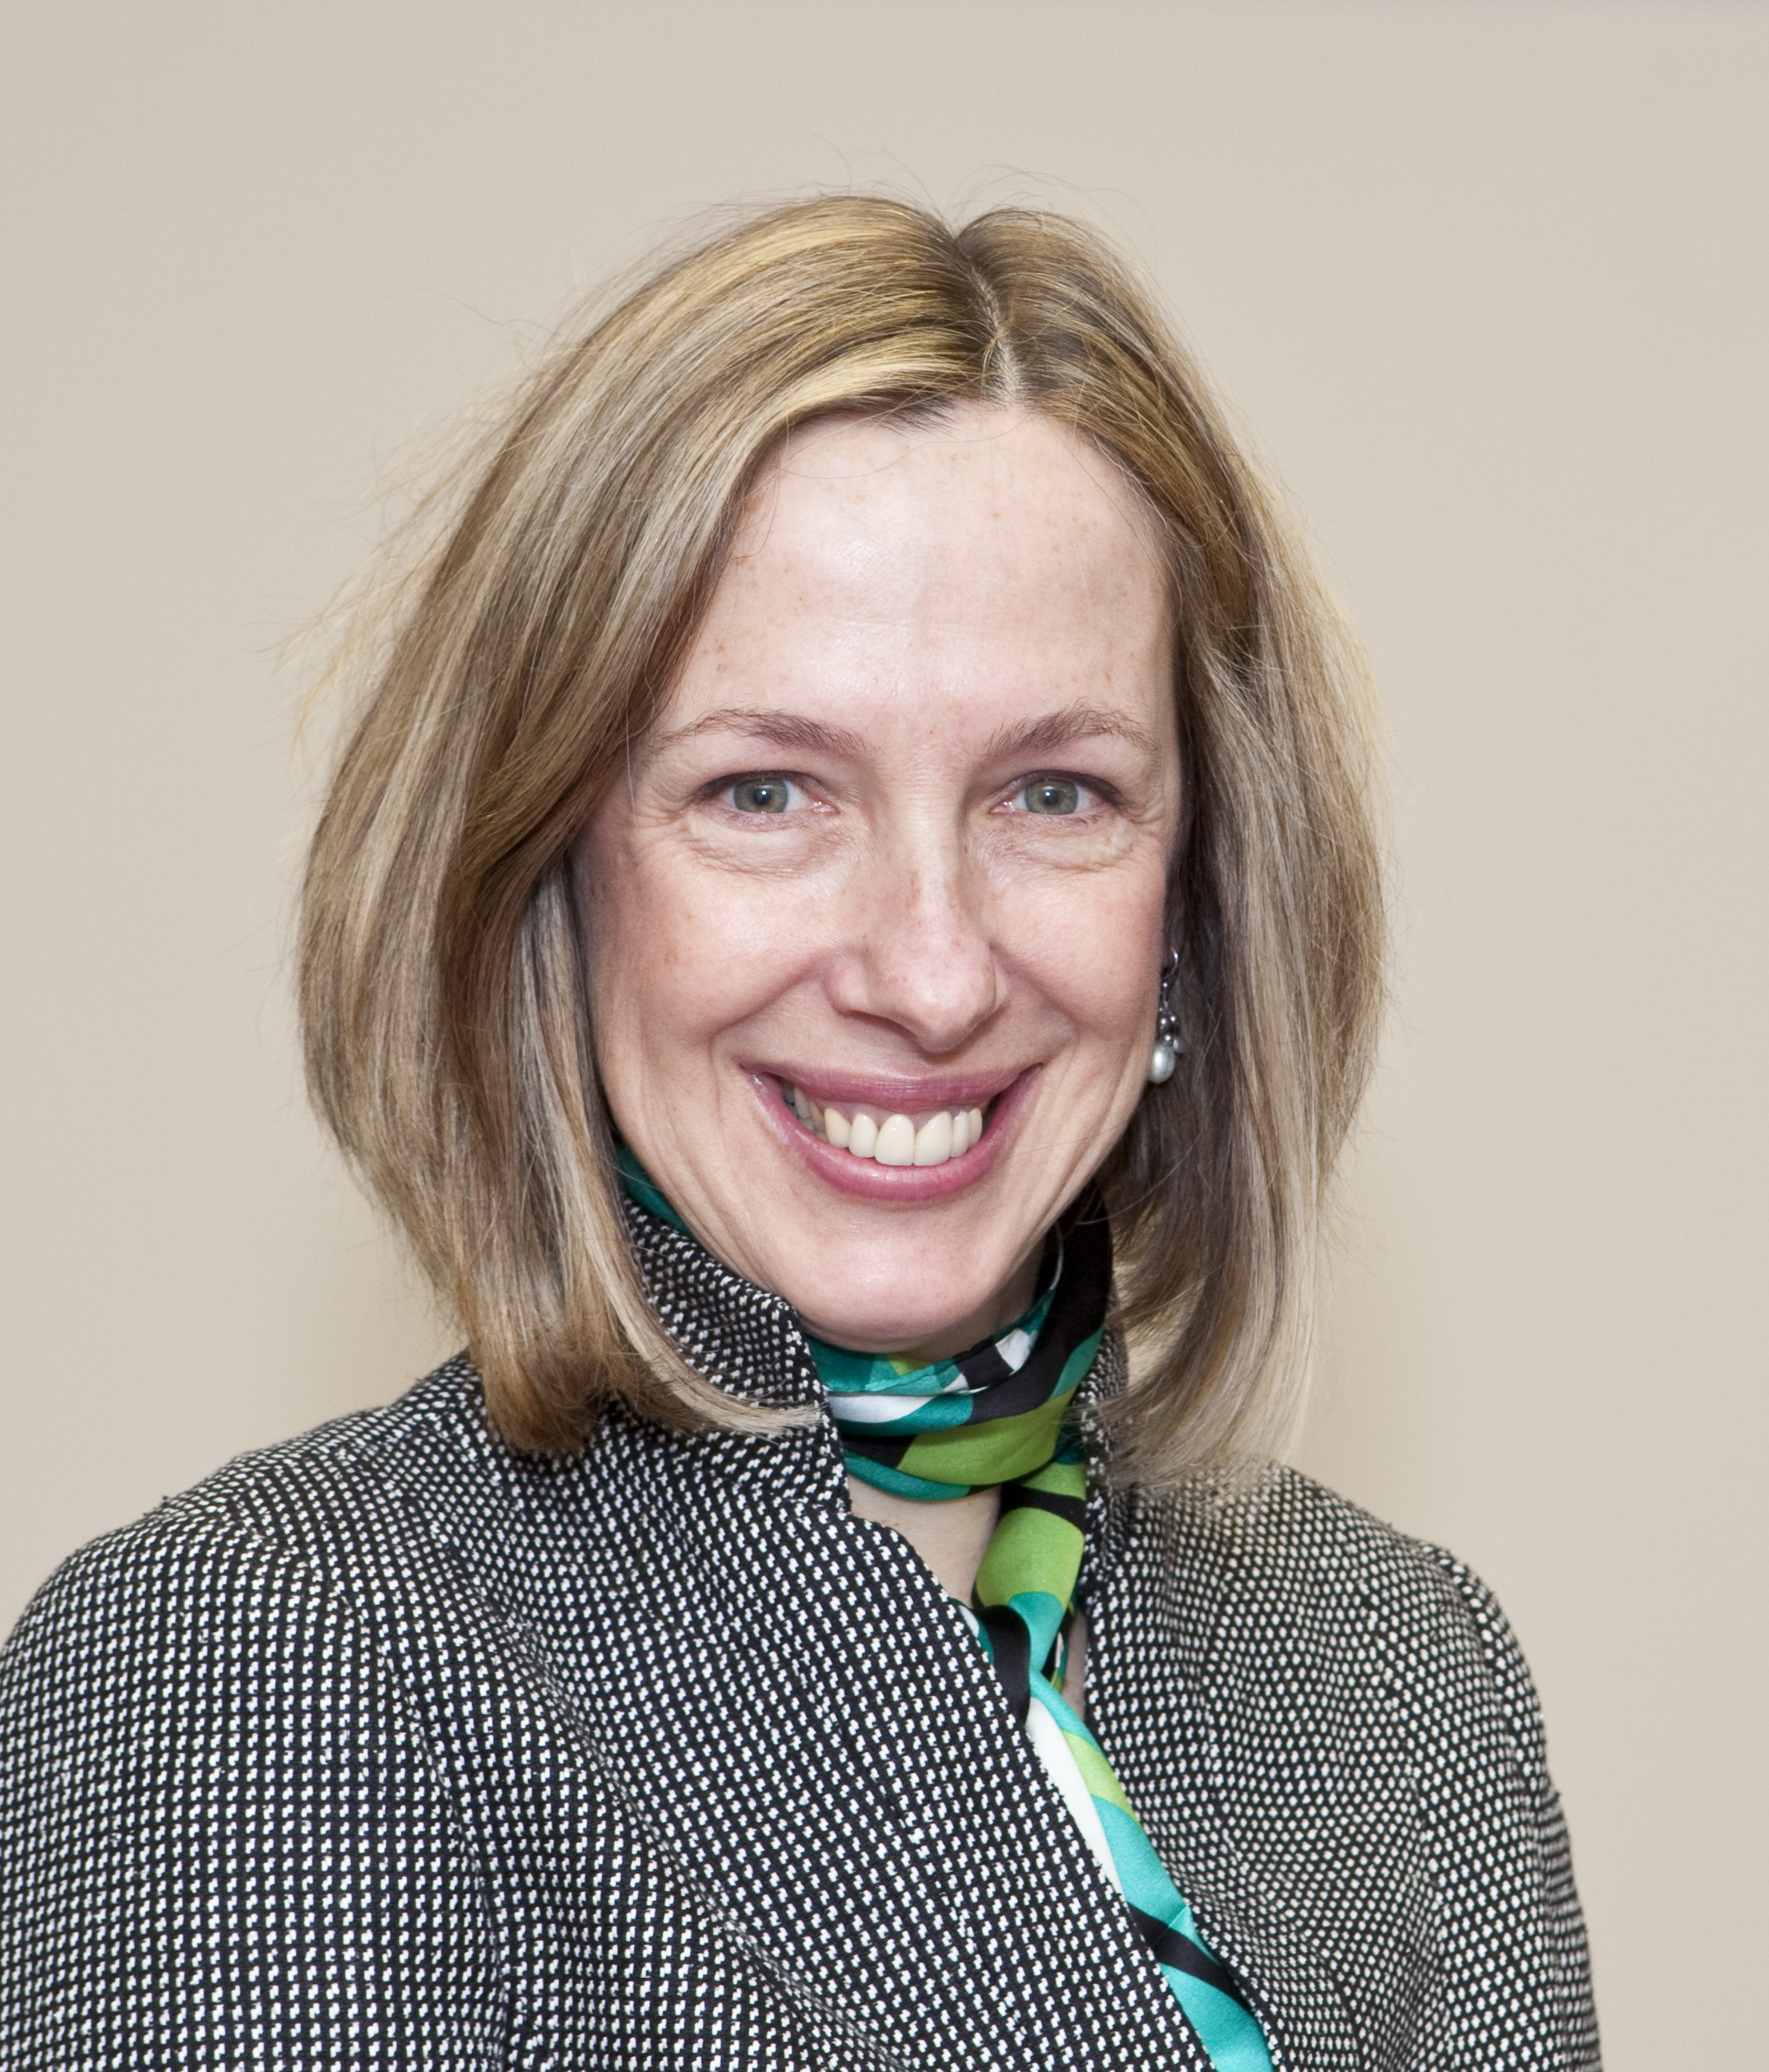 Carol R. Bradford, M.D., FACS